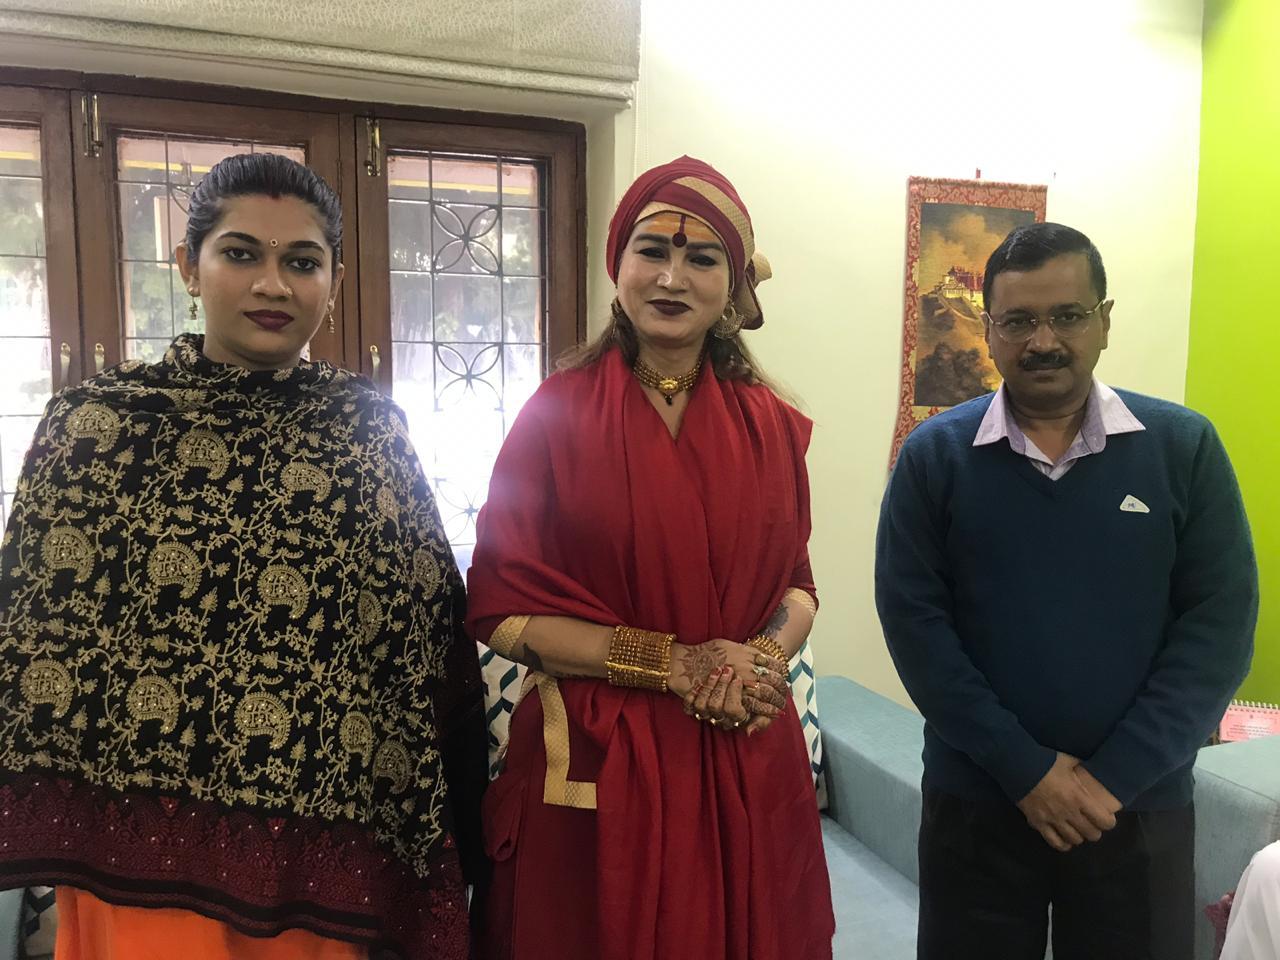 Transgenders met Kejriwal to ask for support in Transgender Bill in Parliament